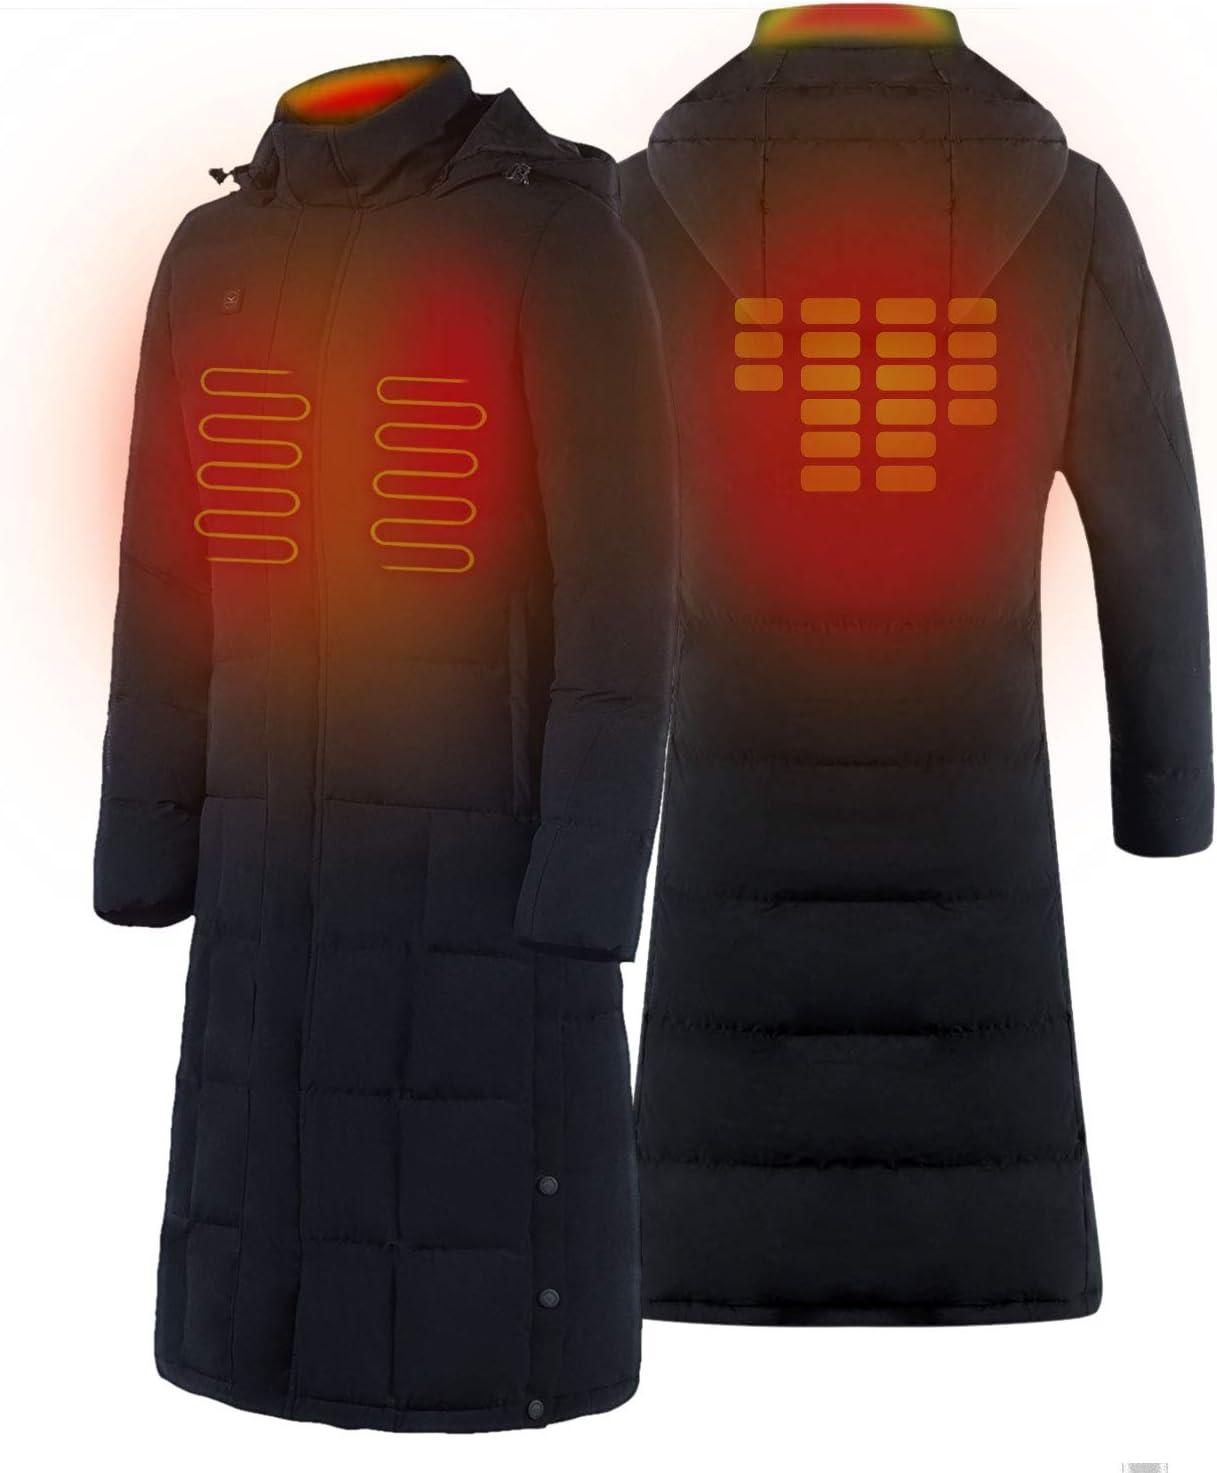 Amazon coupon code for Kempgear Heated Jacket Lightweight Cotton